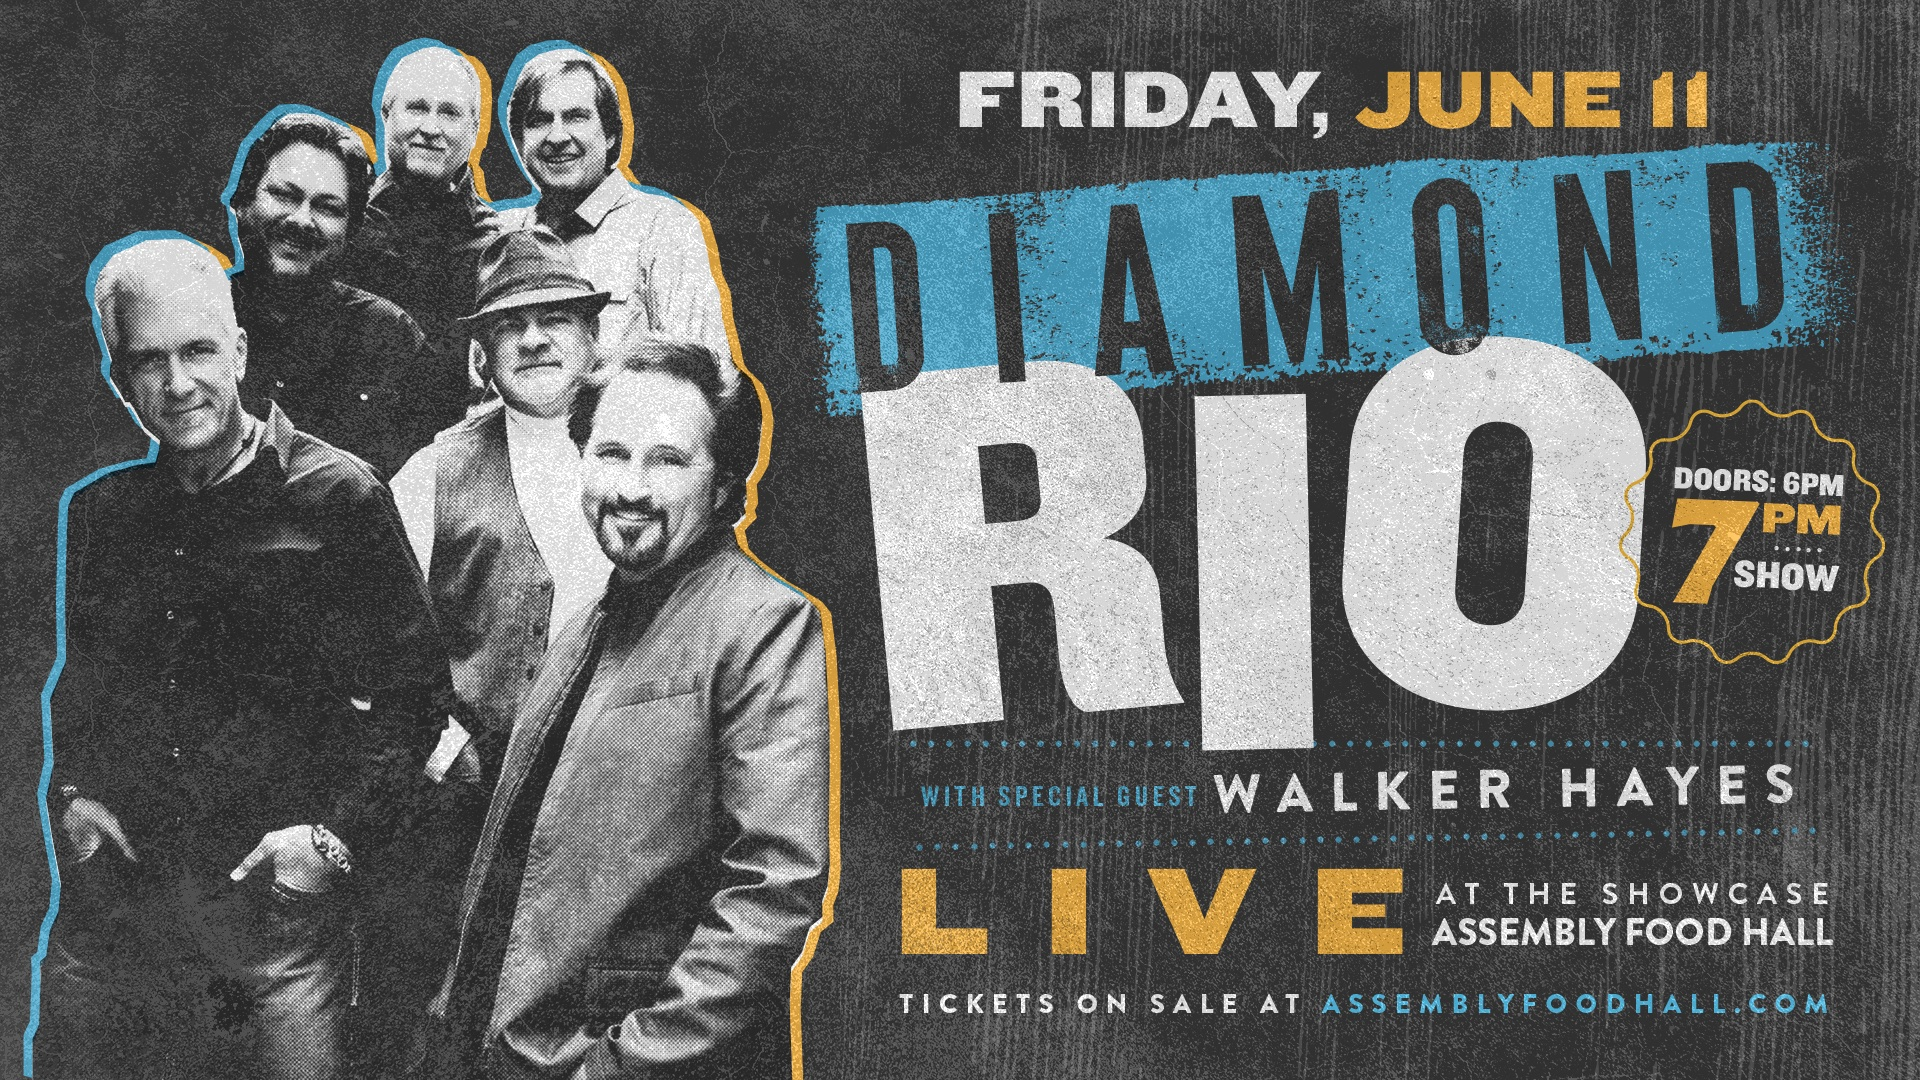 Diamond Rio at Assembly Hall's Grand Opening Celebration - hero